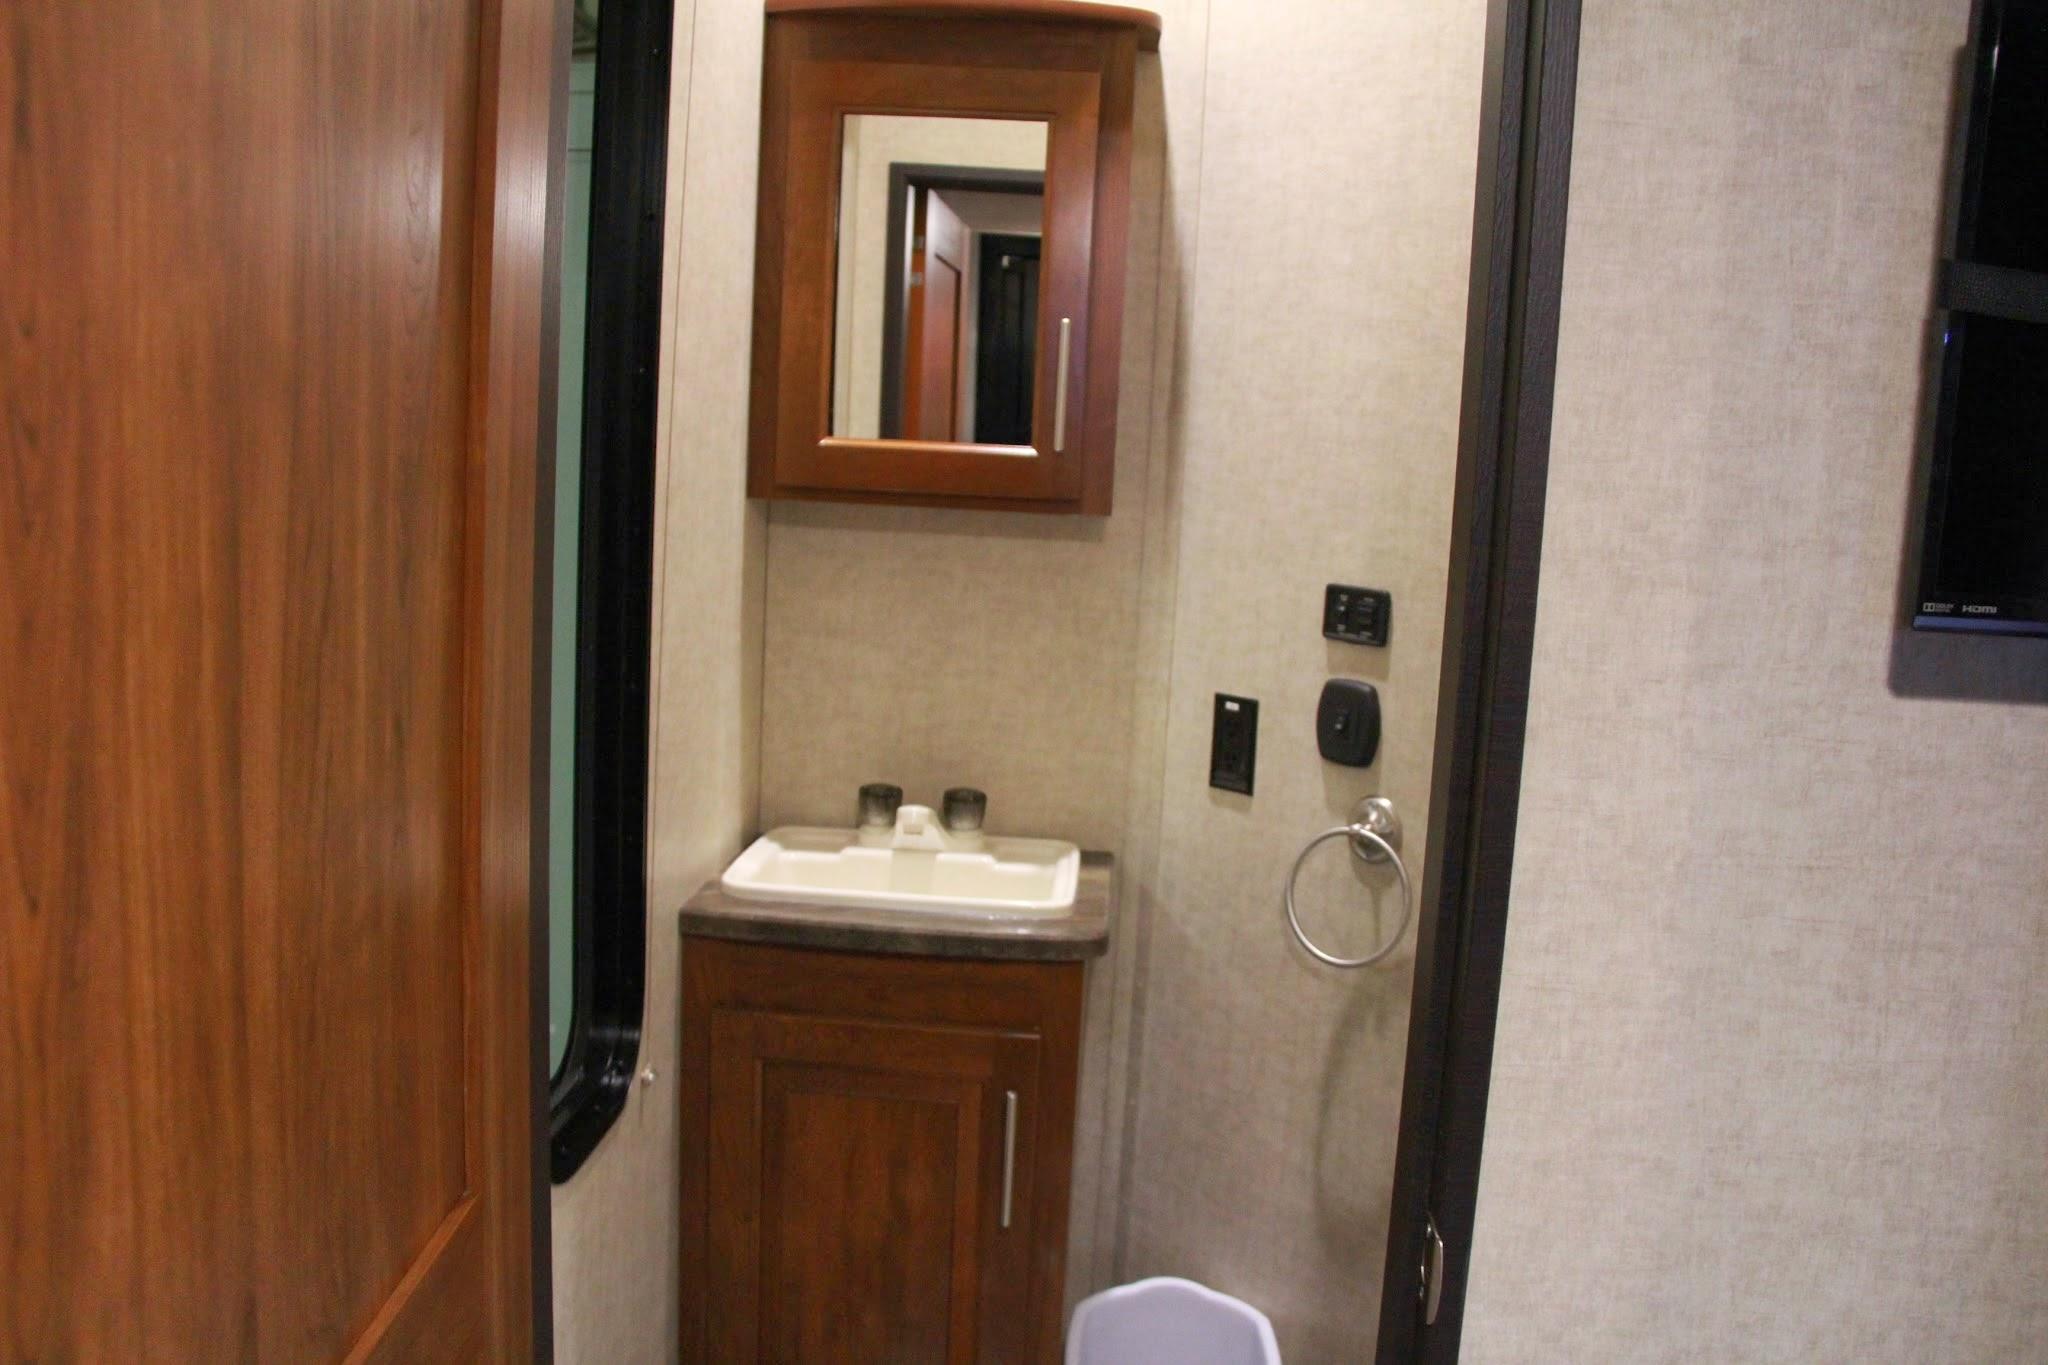 2014 keystone fuzion 371 rv bathroom lifestyle for Rv bathroom wallpaper